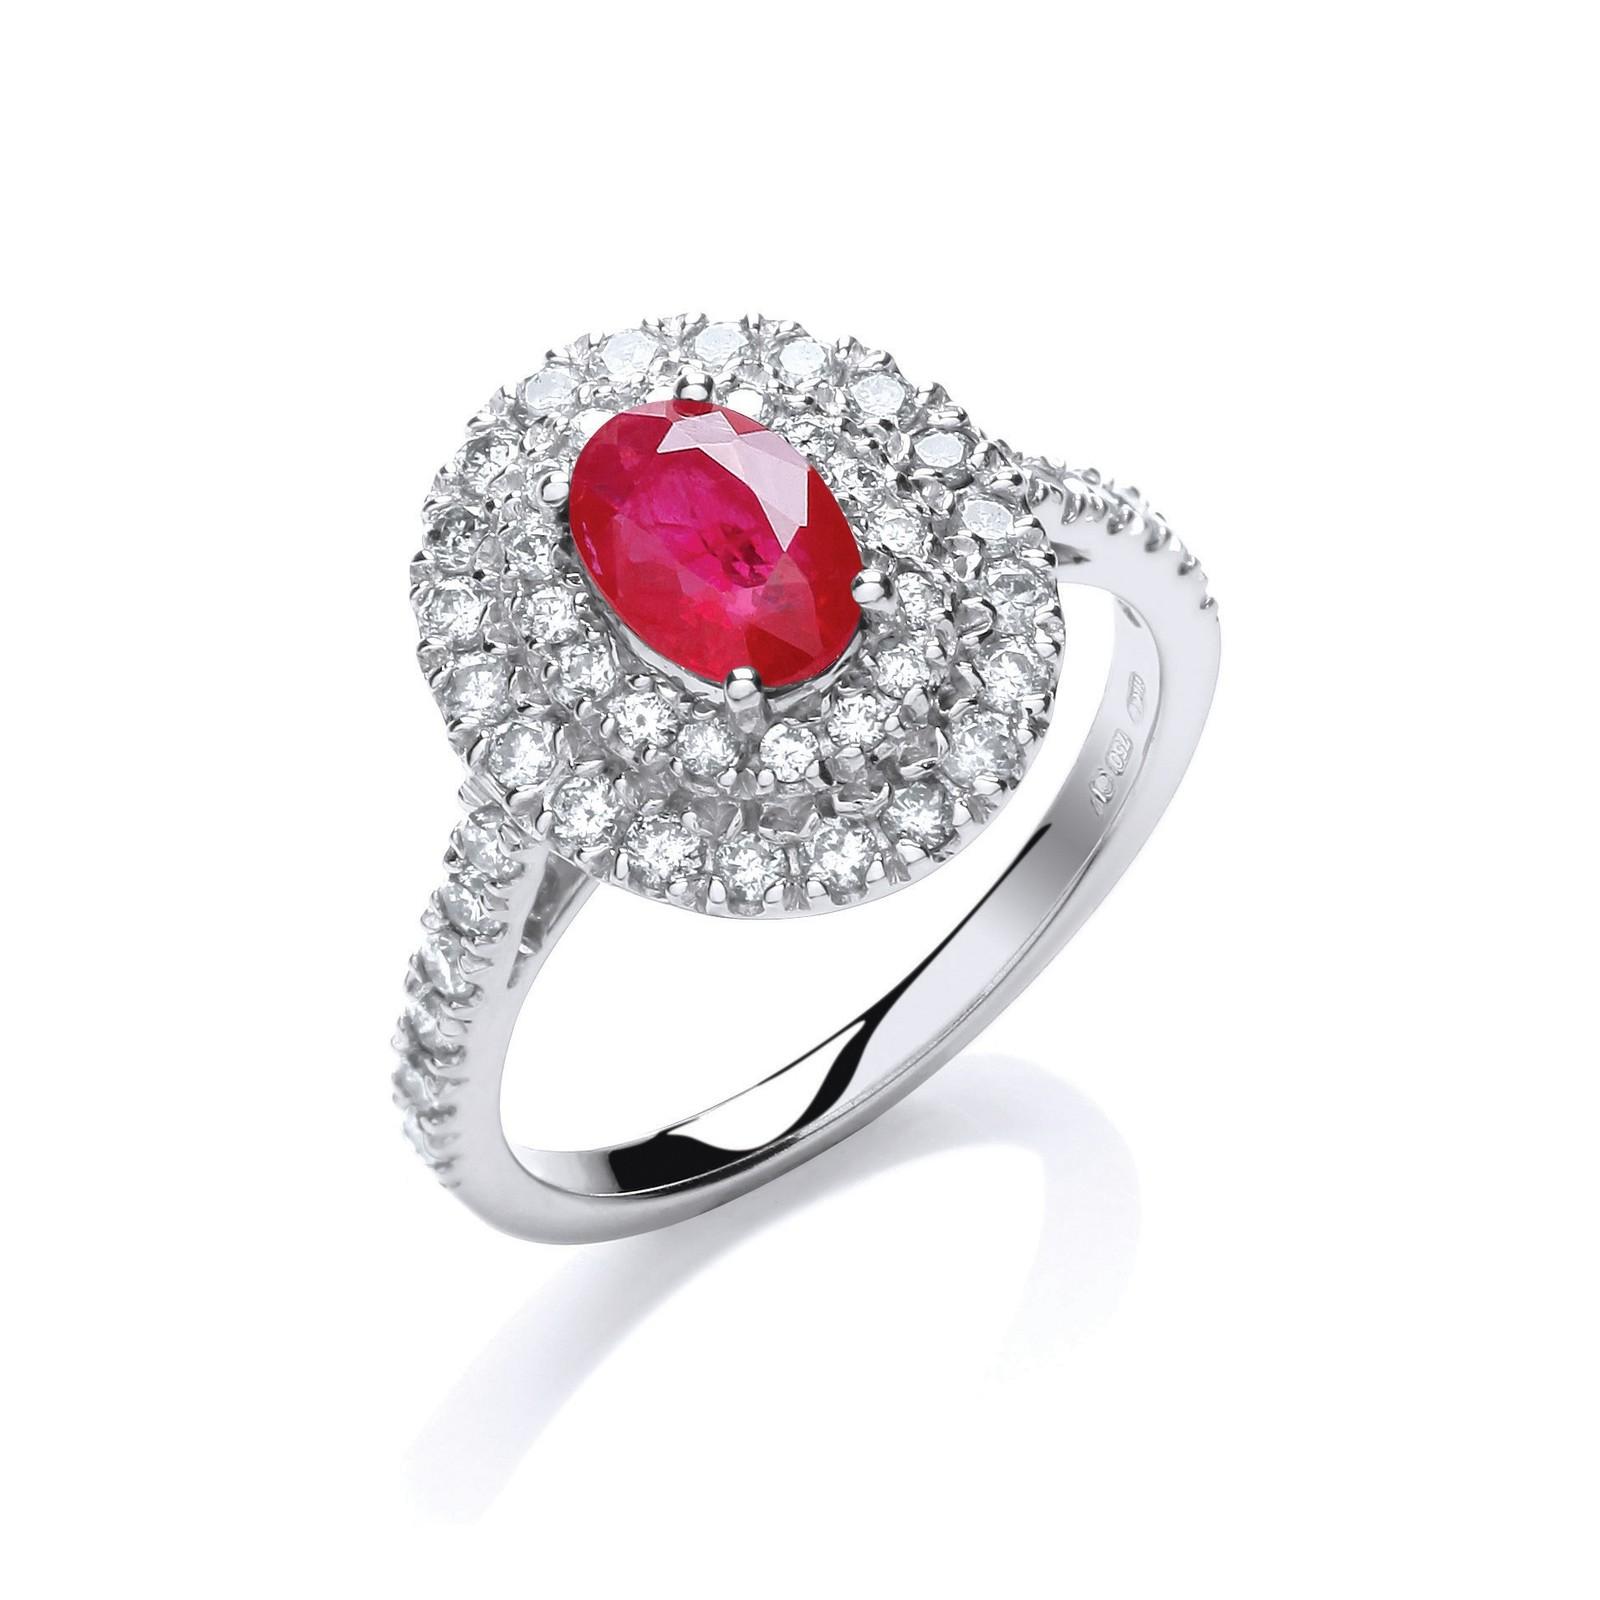 18ct W/G 0.60ct Diamond, 0.90ct 7x5mm Oval Ruby Ring